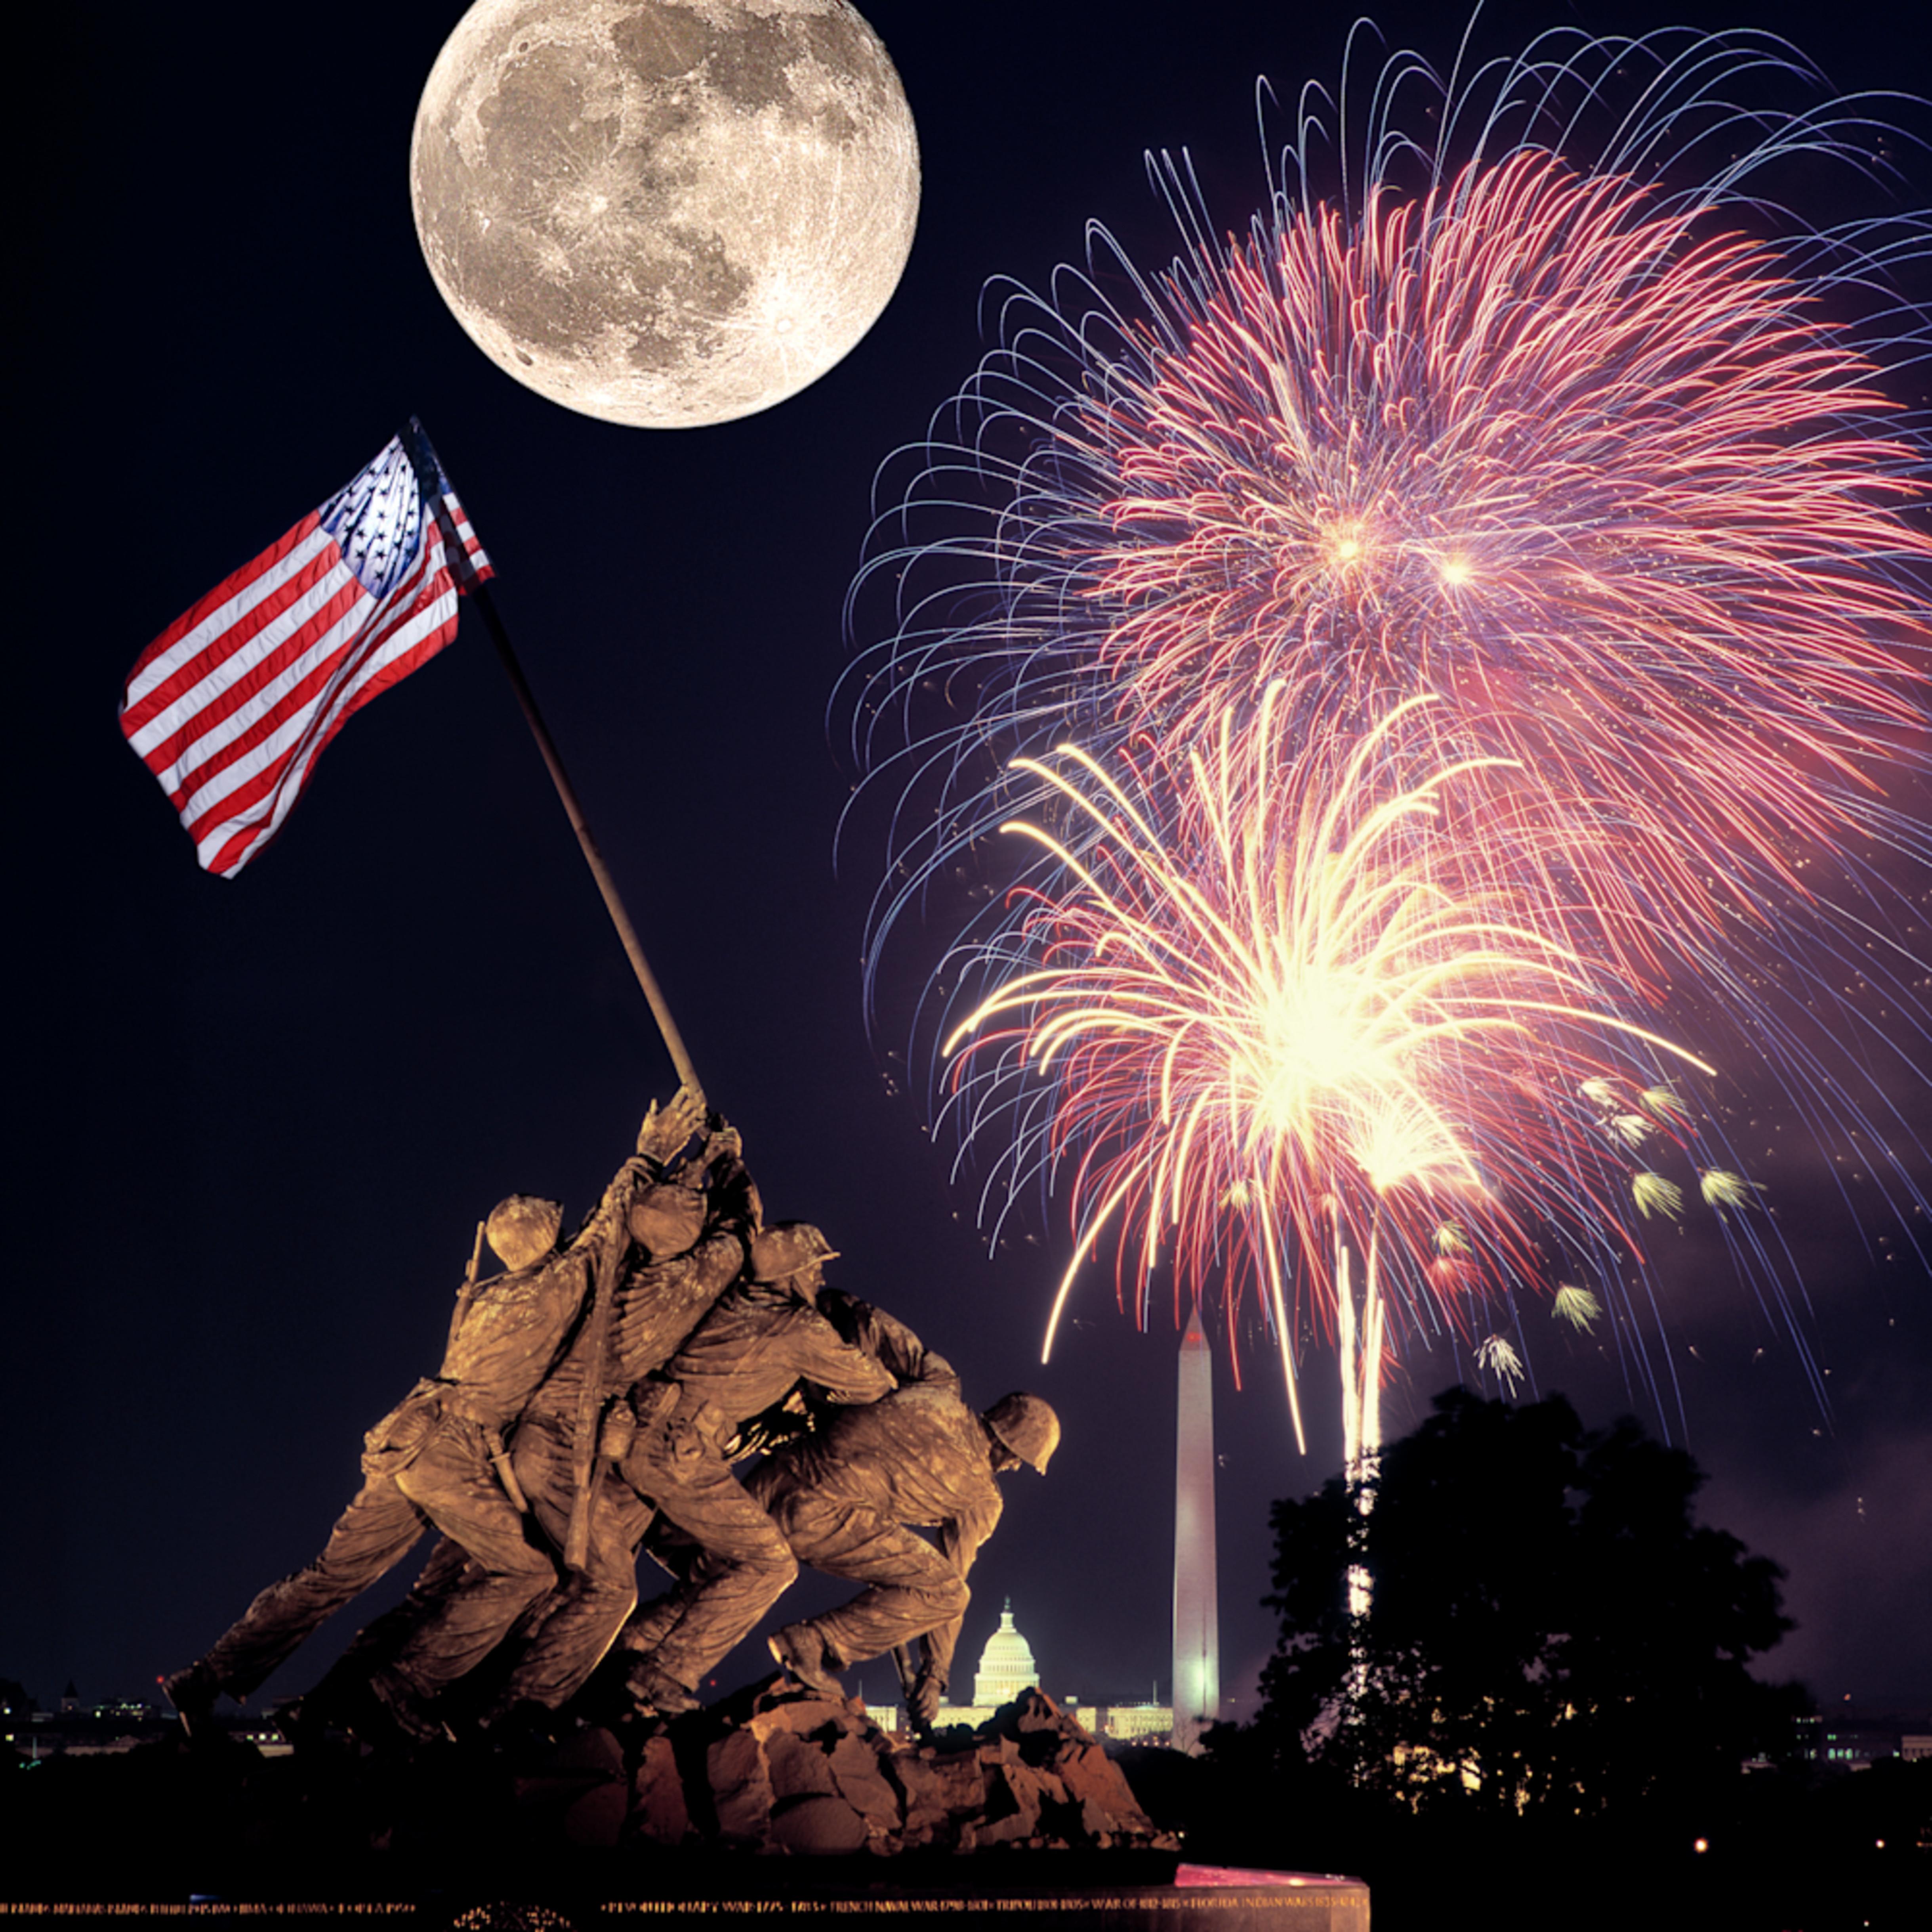 Iwo jima fireworks moon v8a9yn